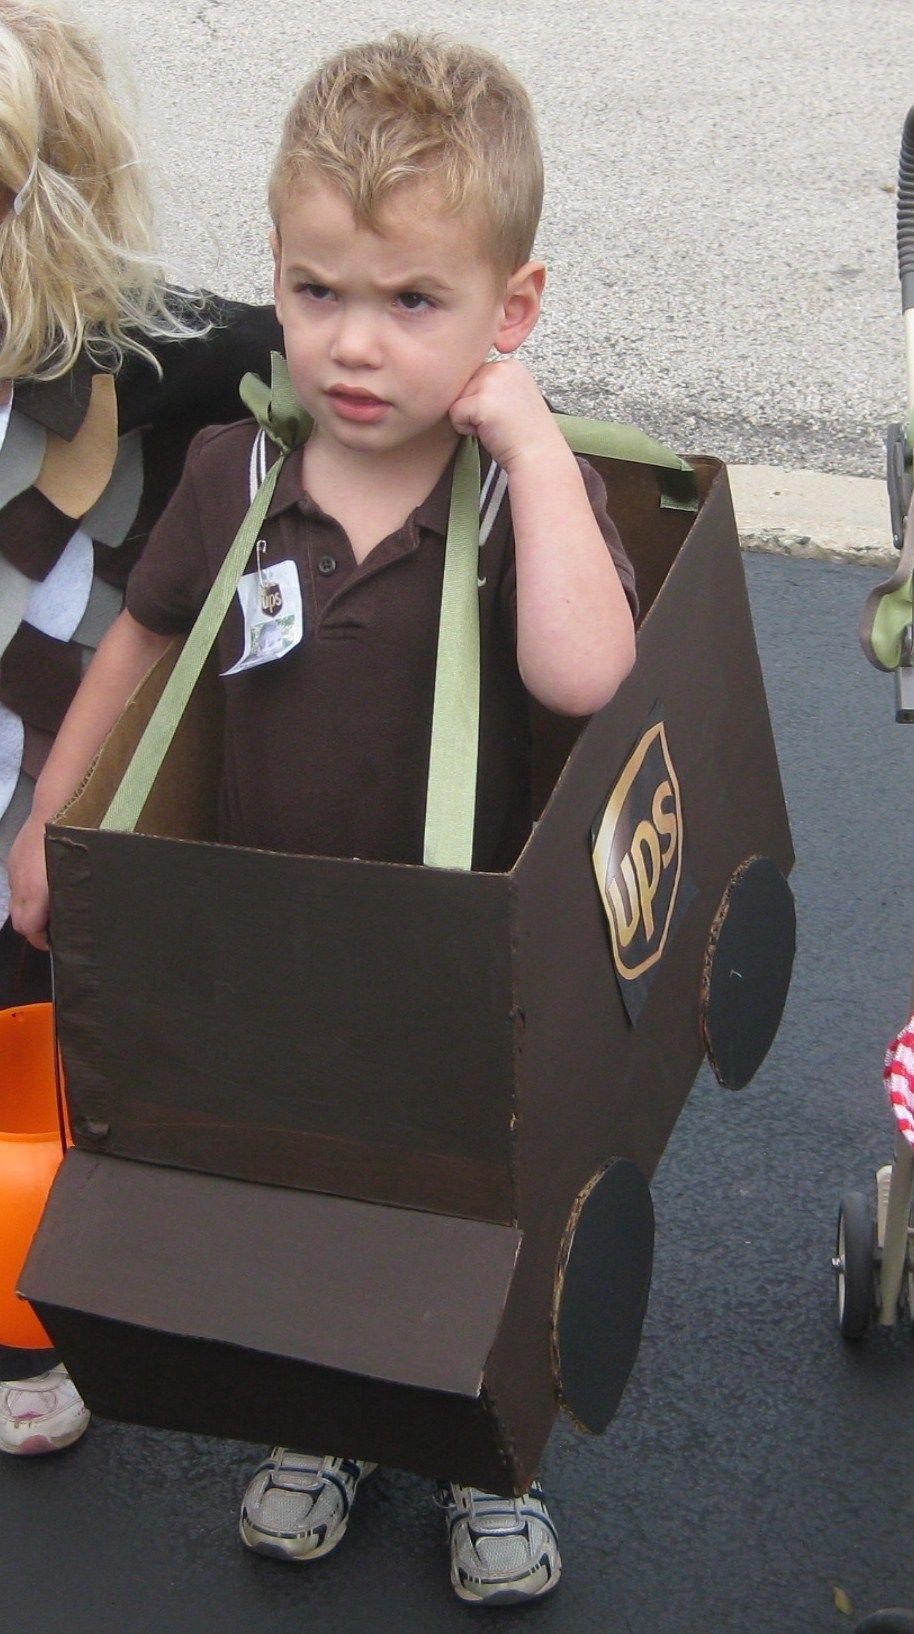 ... ups driver costume ...  sc 1 st  Best Kids Costumes & Ups Costume For Kids - Best Kids Costumes